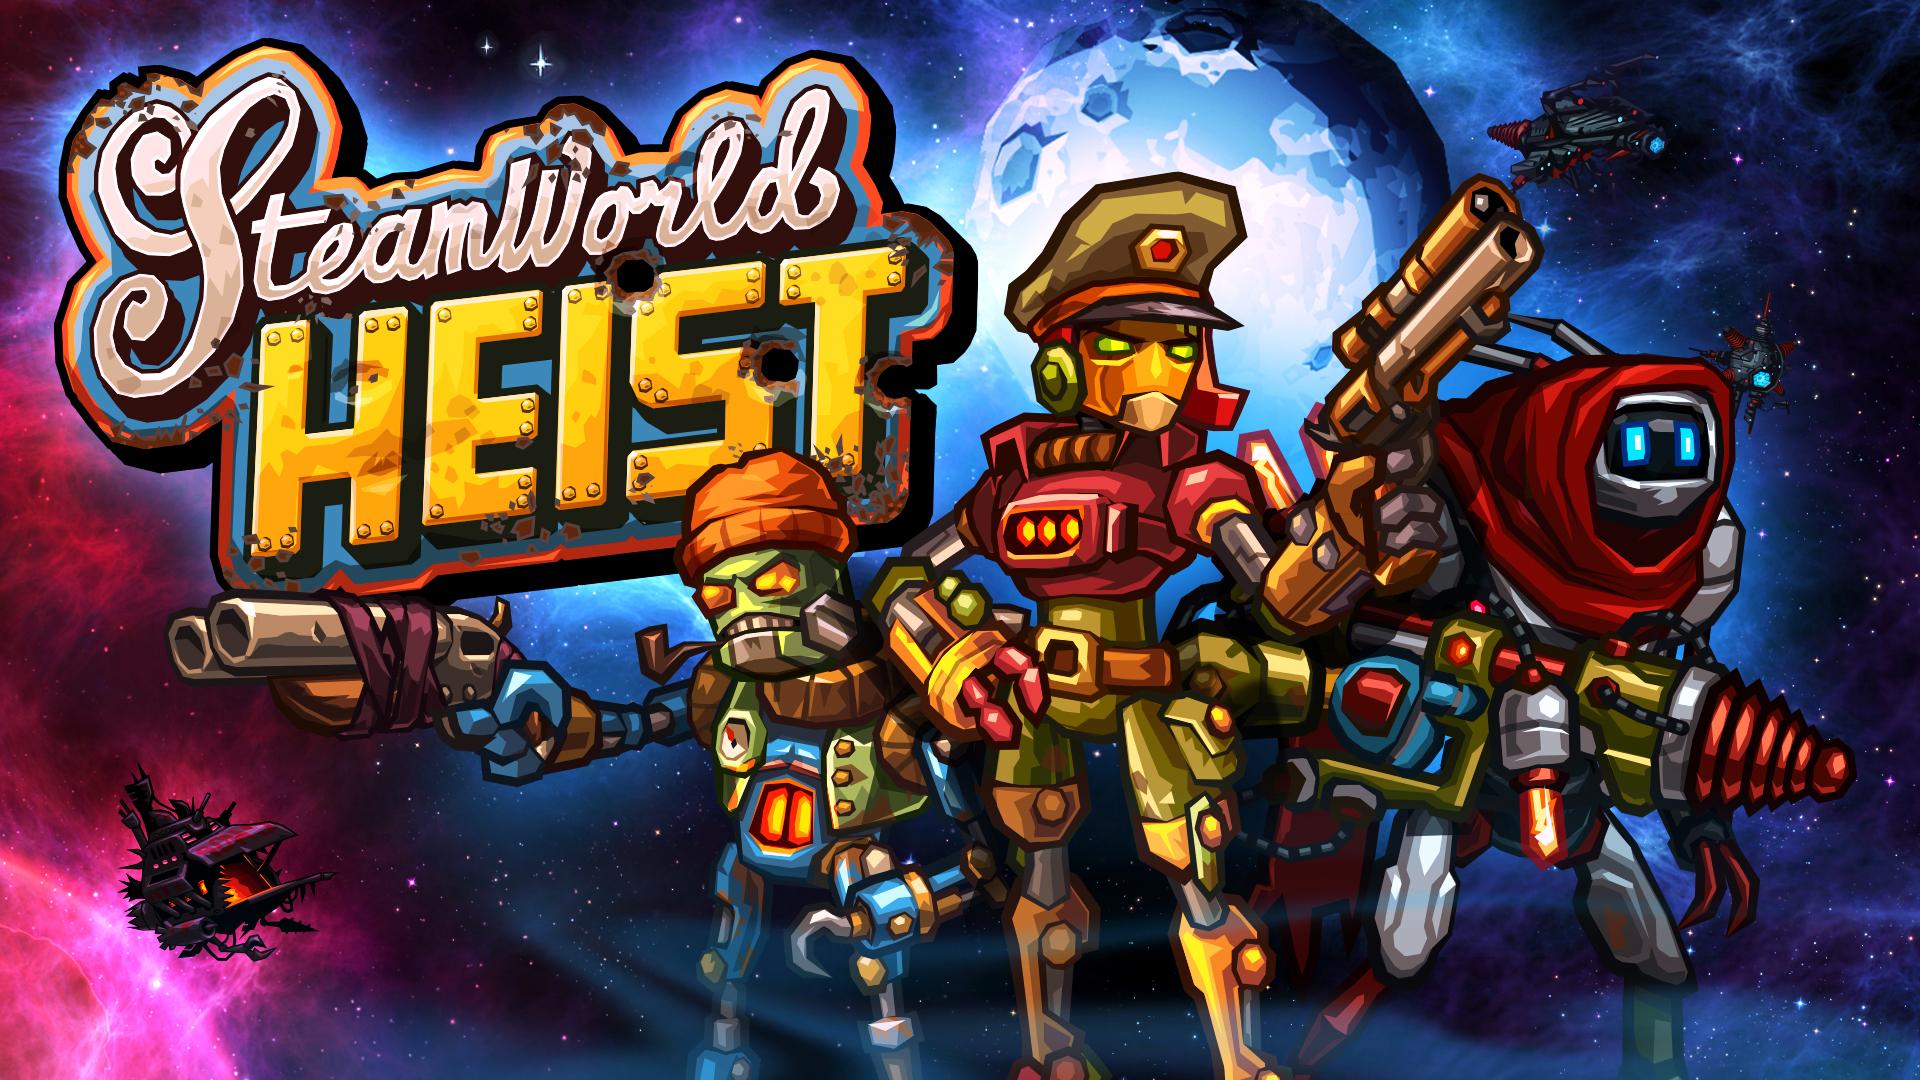 Nintendo eShop Mexico: Steamworld Heist Ultimate Edition